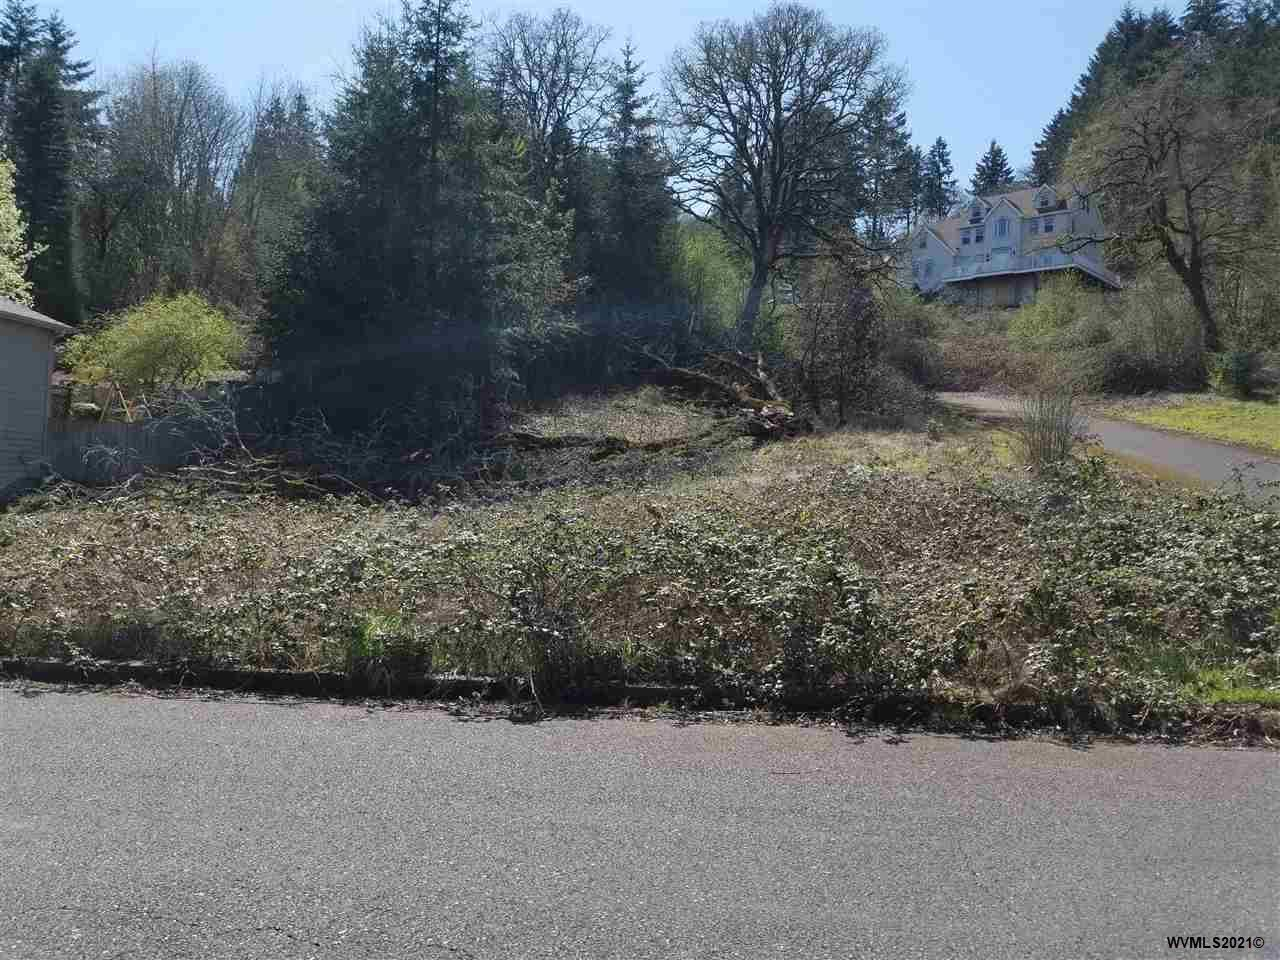 Photo of Lot 40 Morrow Ct, Salem, OR 97304 (MLS # 775827)